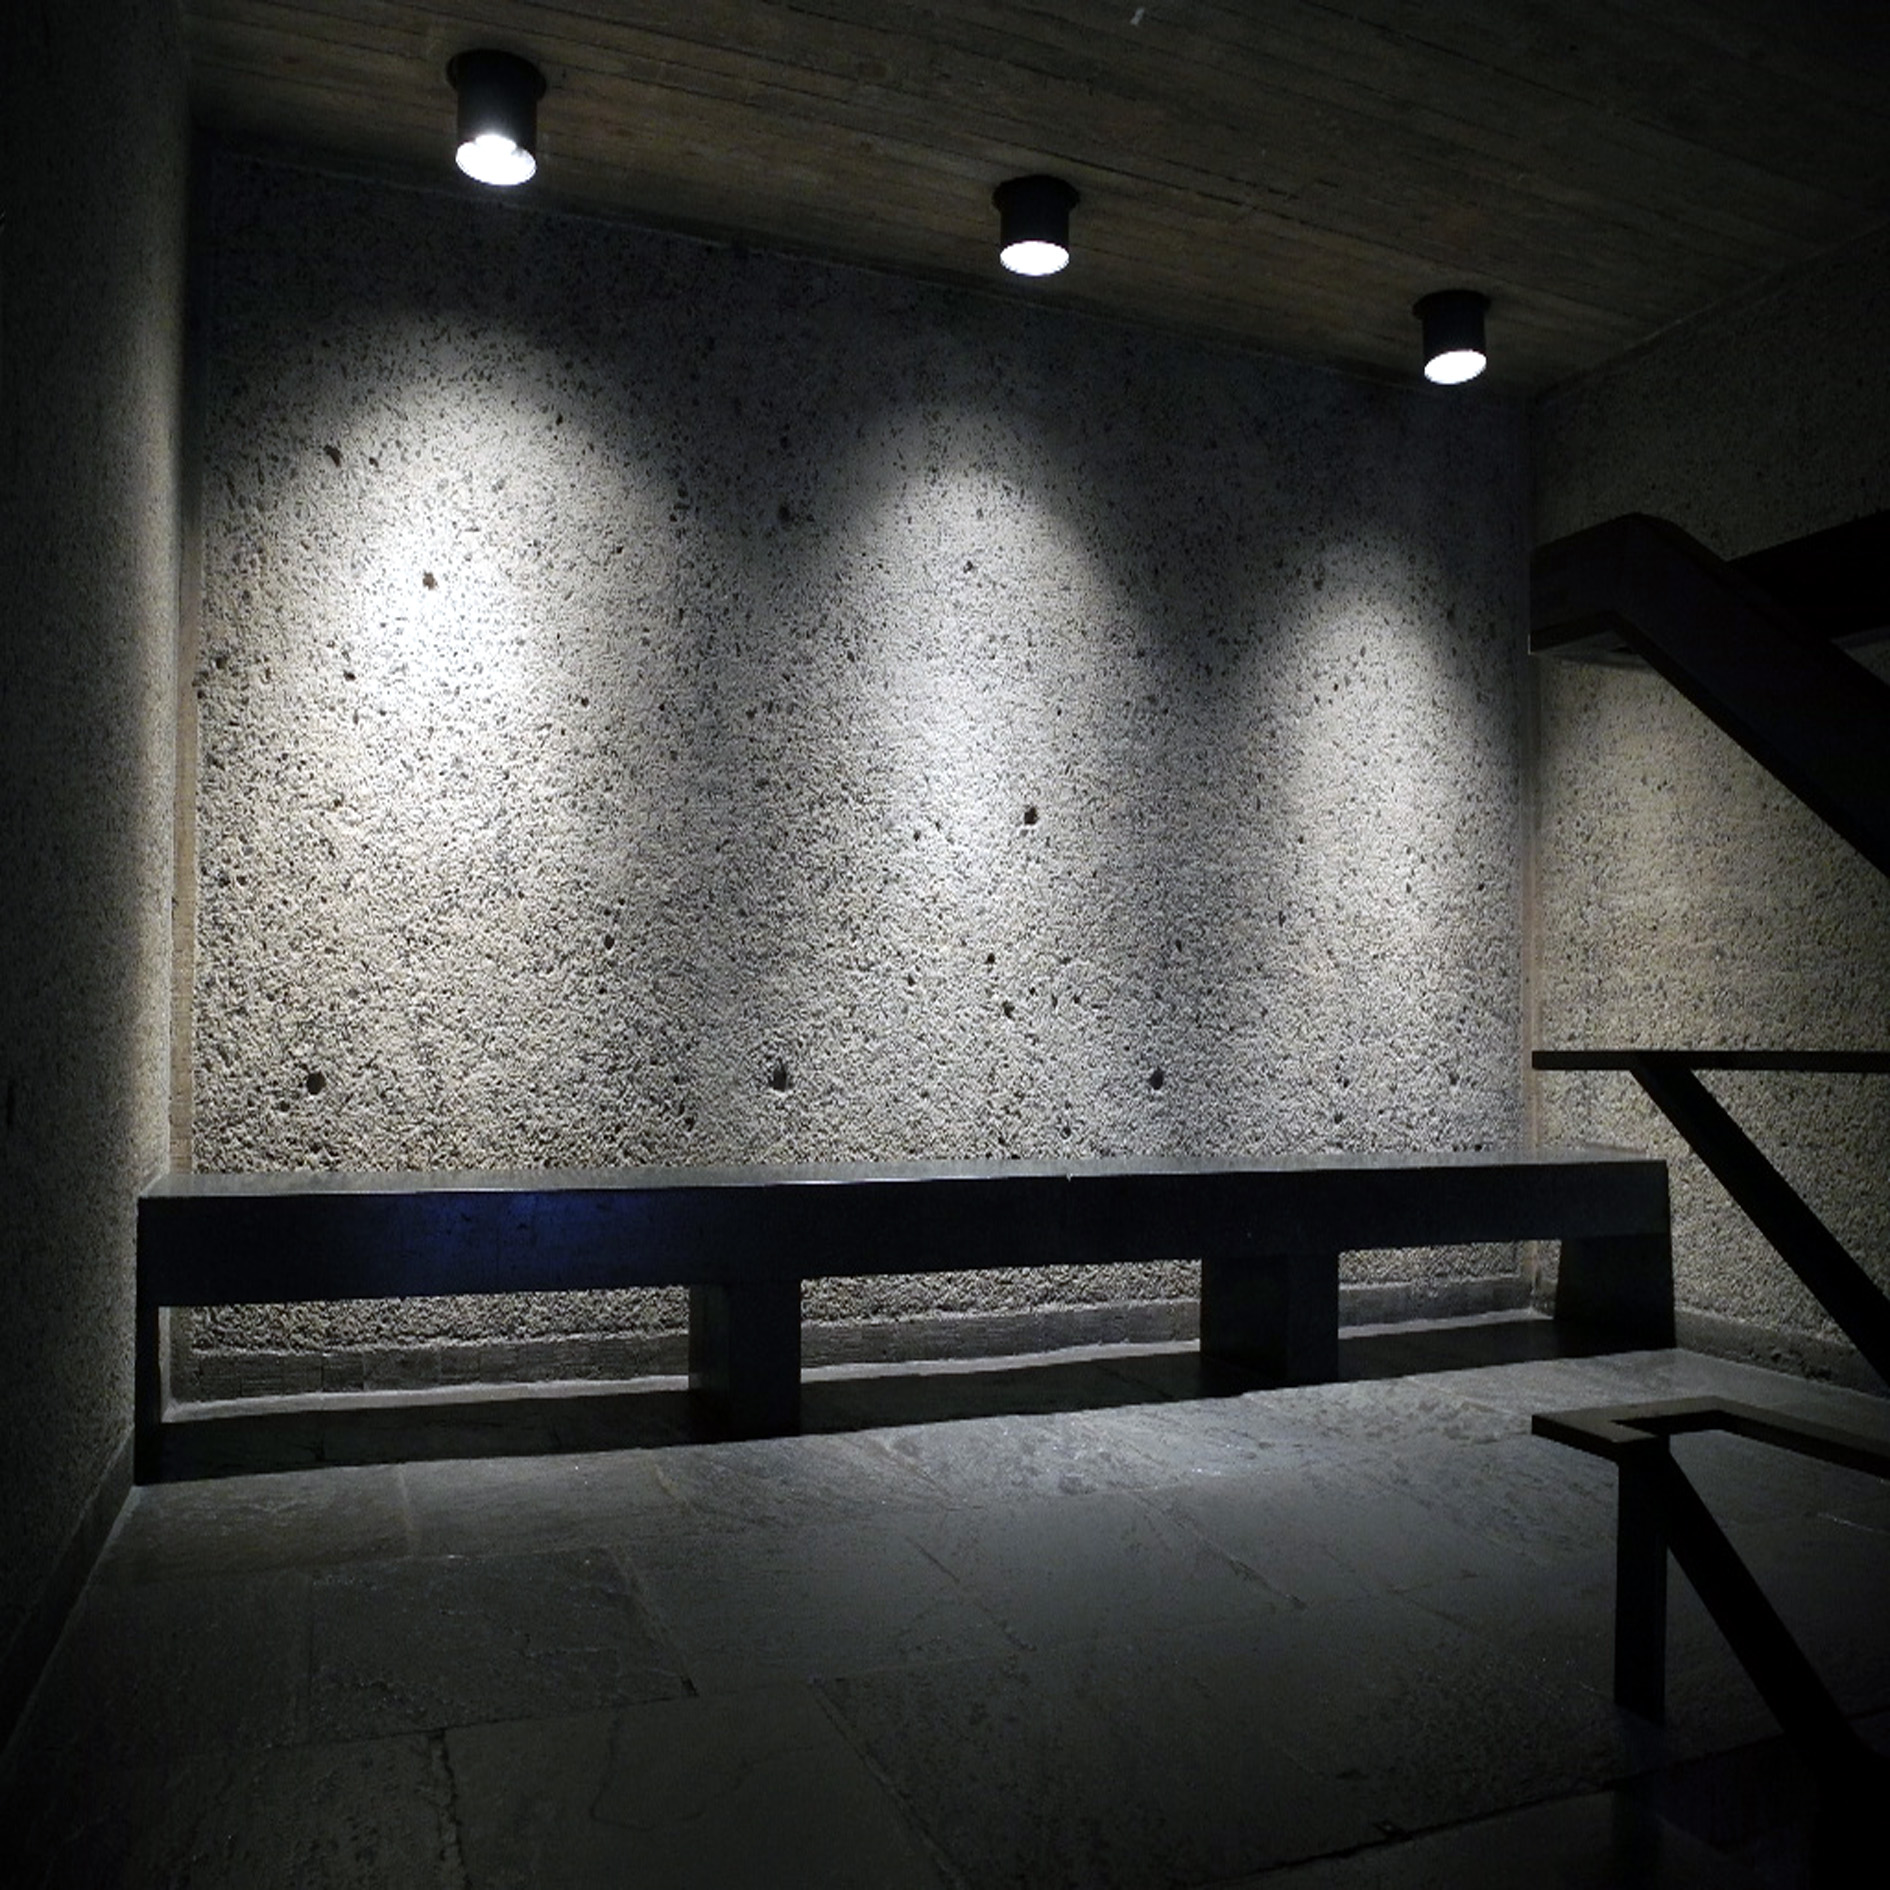 Breuer's space